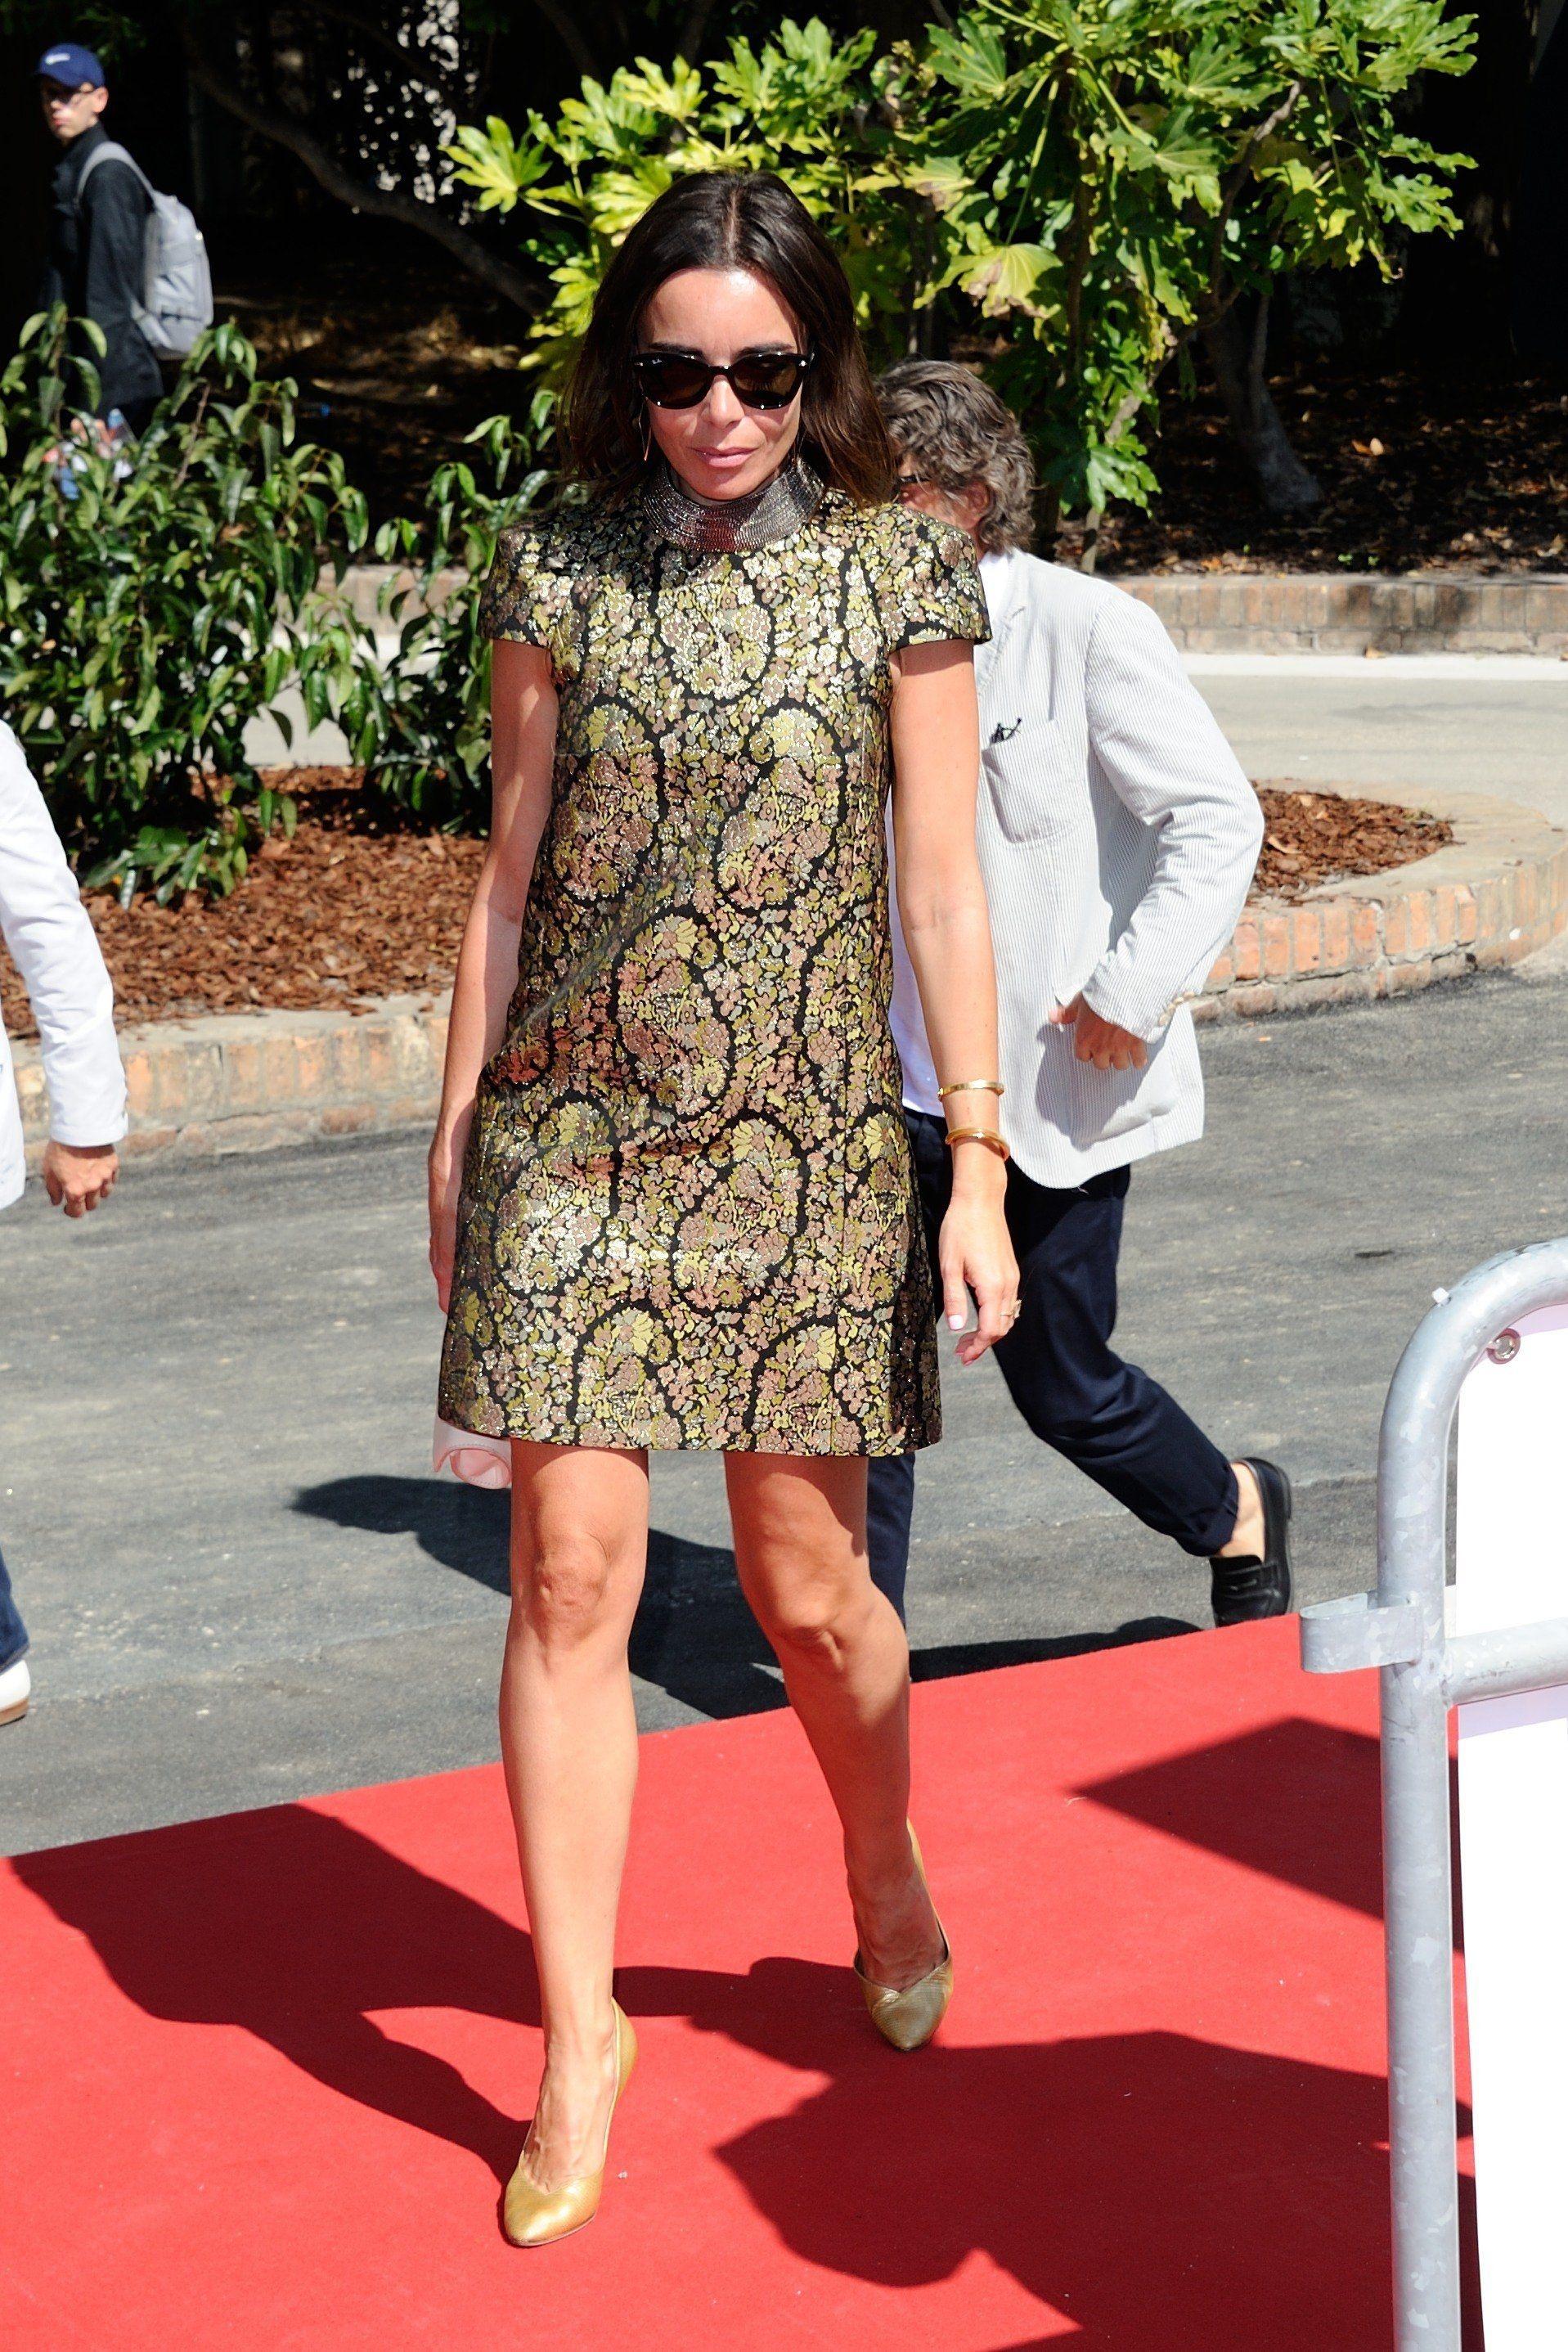 Elodie Bouchez Reality premiere at 71st Venice Film Festival August 28th, 2014